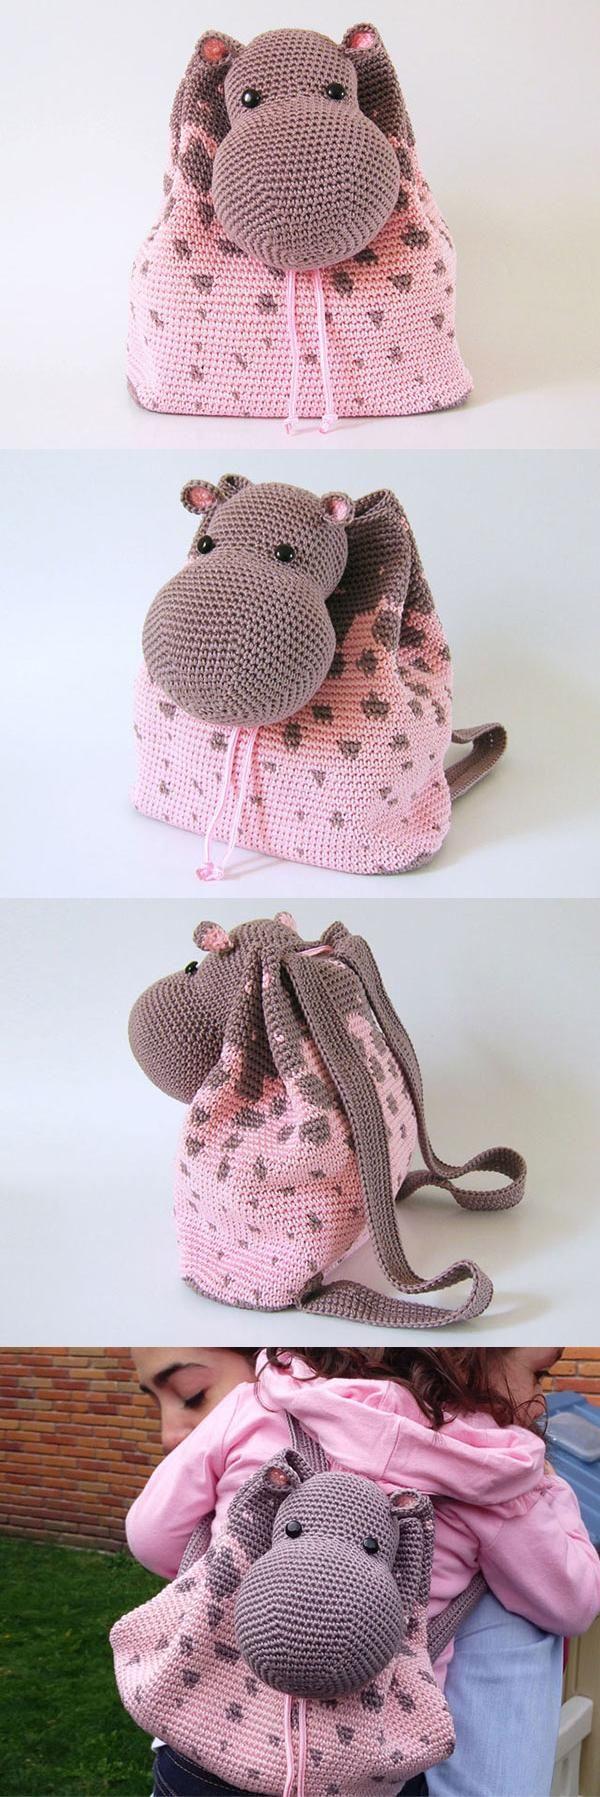 Hippo Backpack crochet pattern by Chabepatterns   Backpacks, Crochet ...